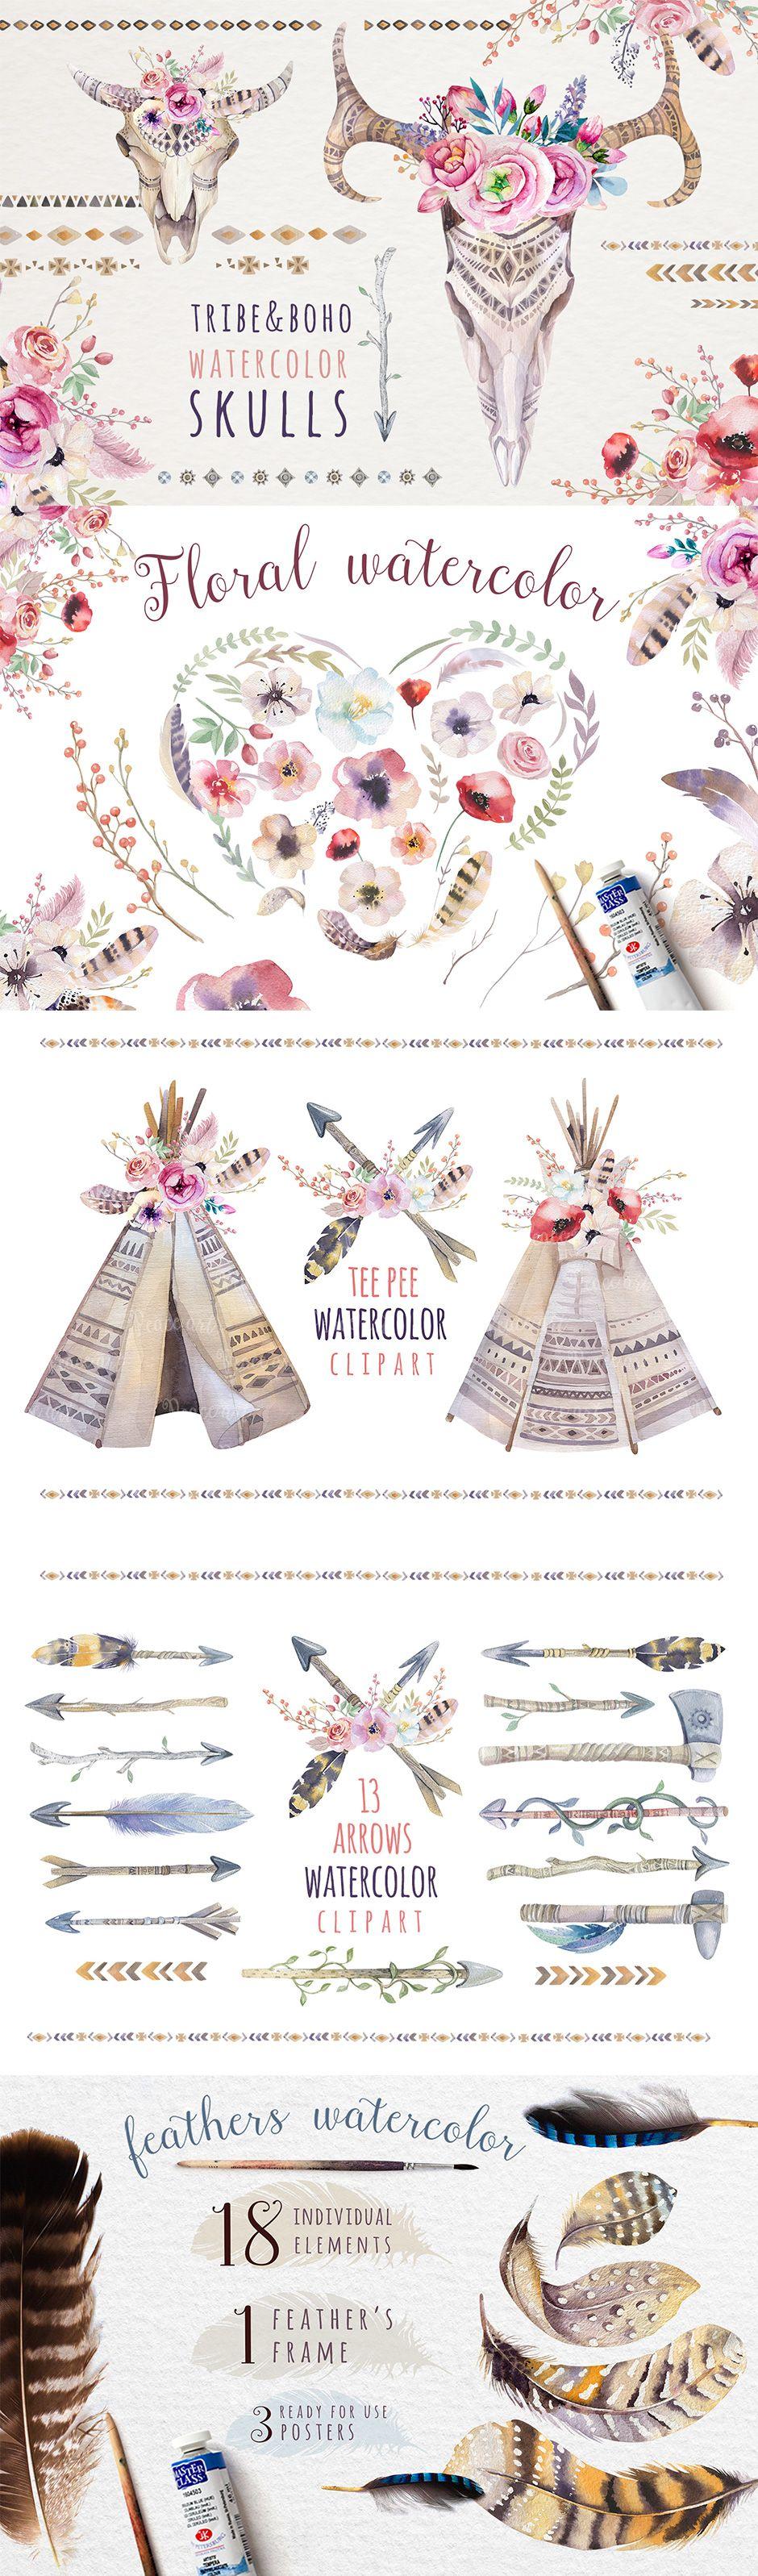 Boho Tribe and Flowers Bundle - https://www.designcuts.com/product/boho-tribe-and-flowers-bundle/